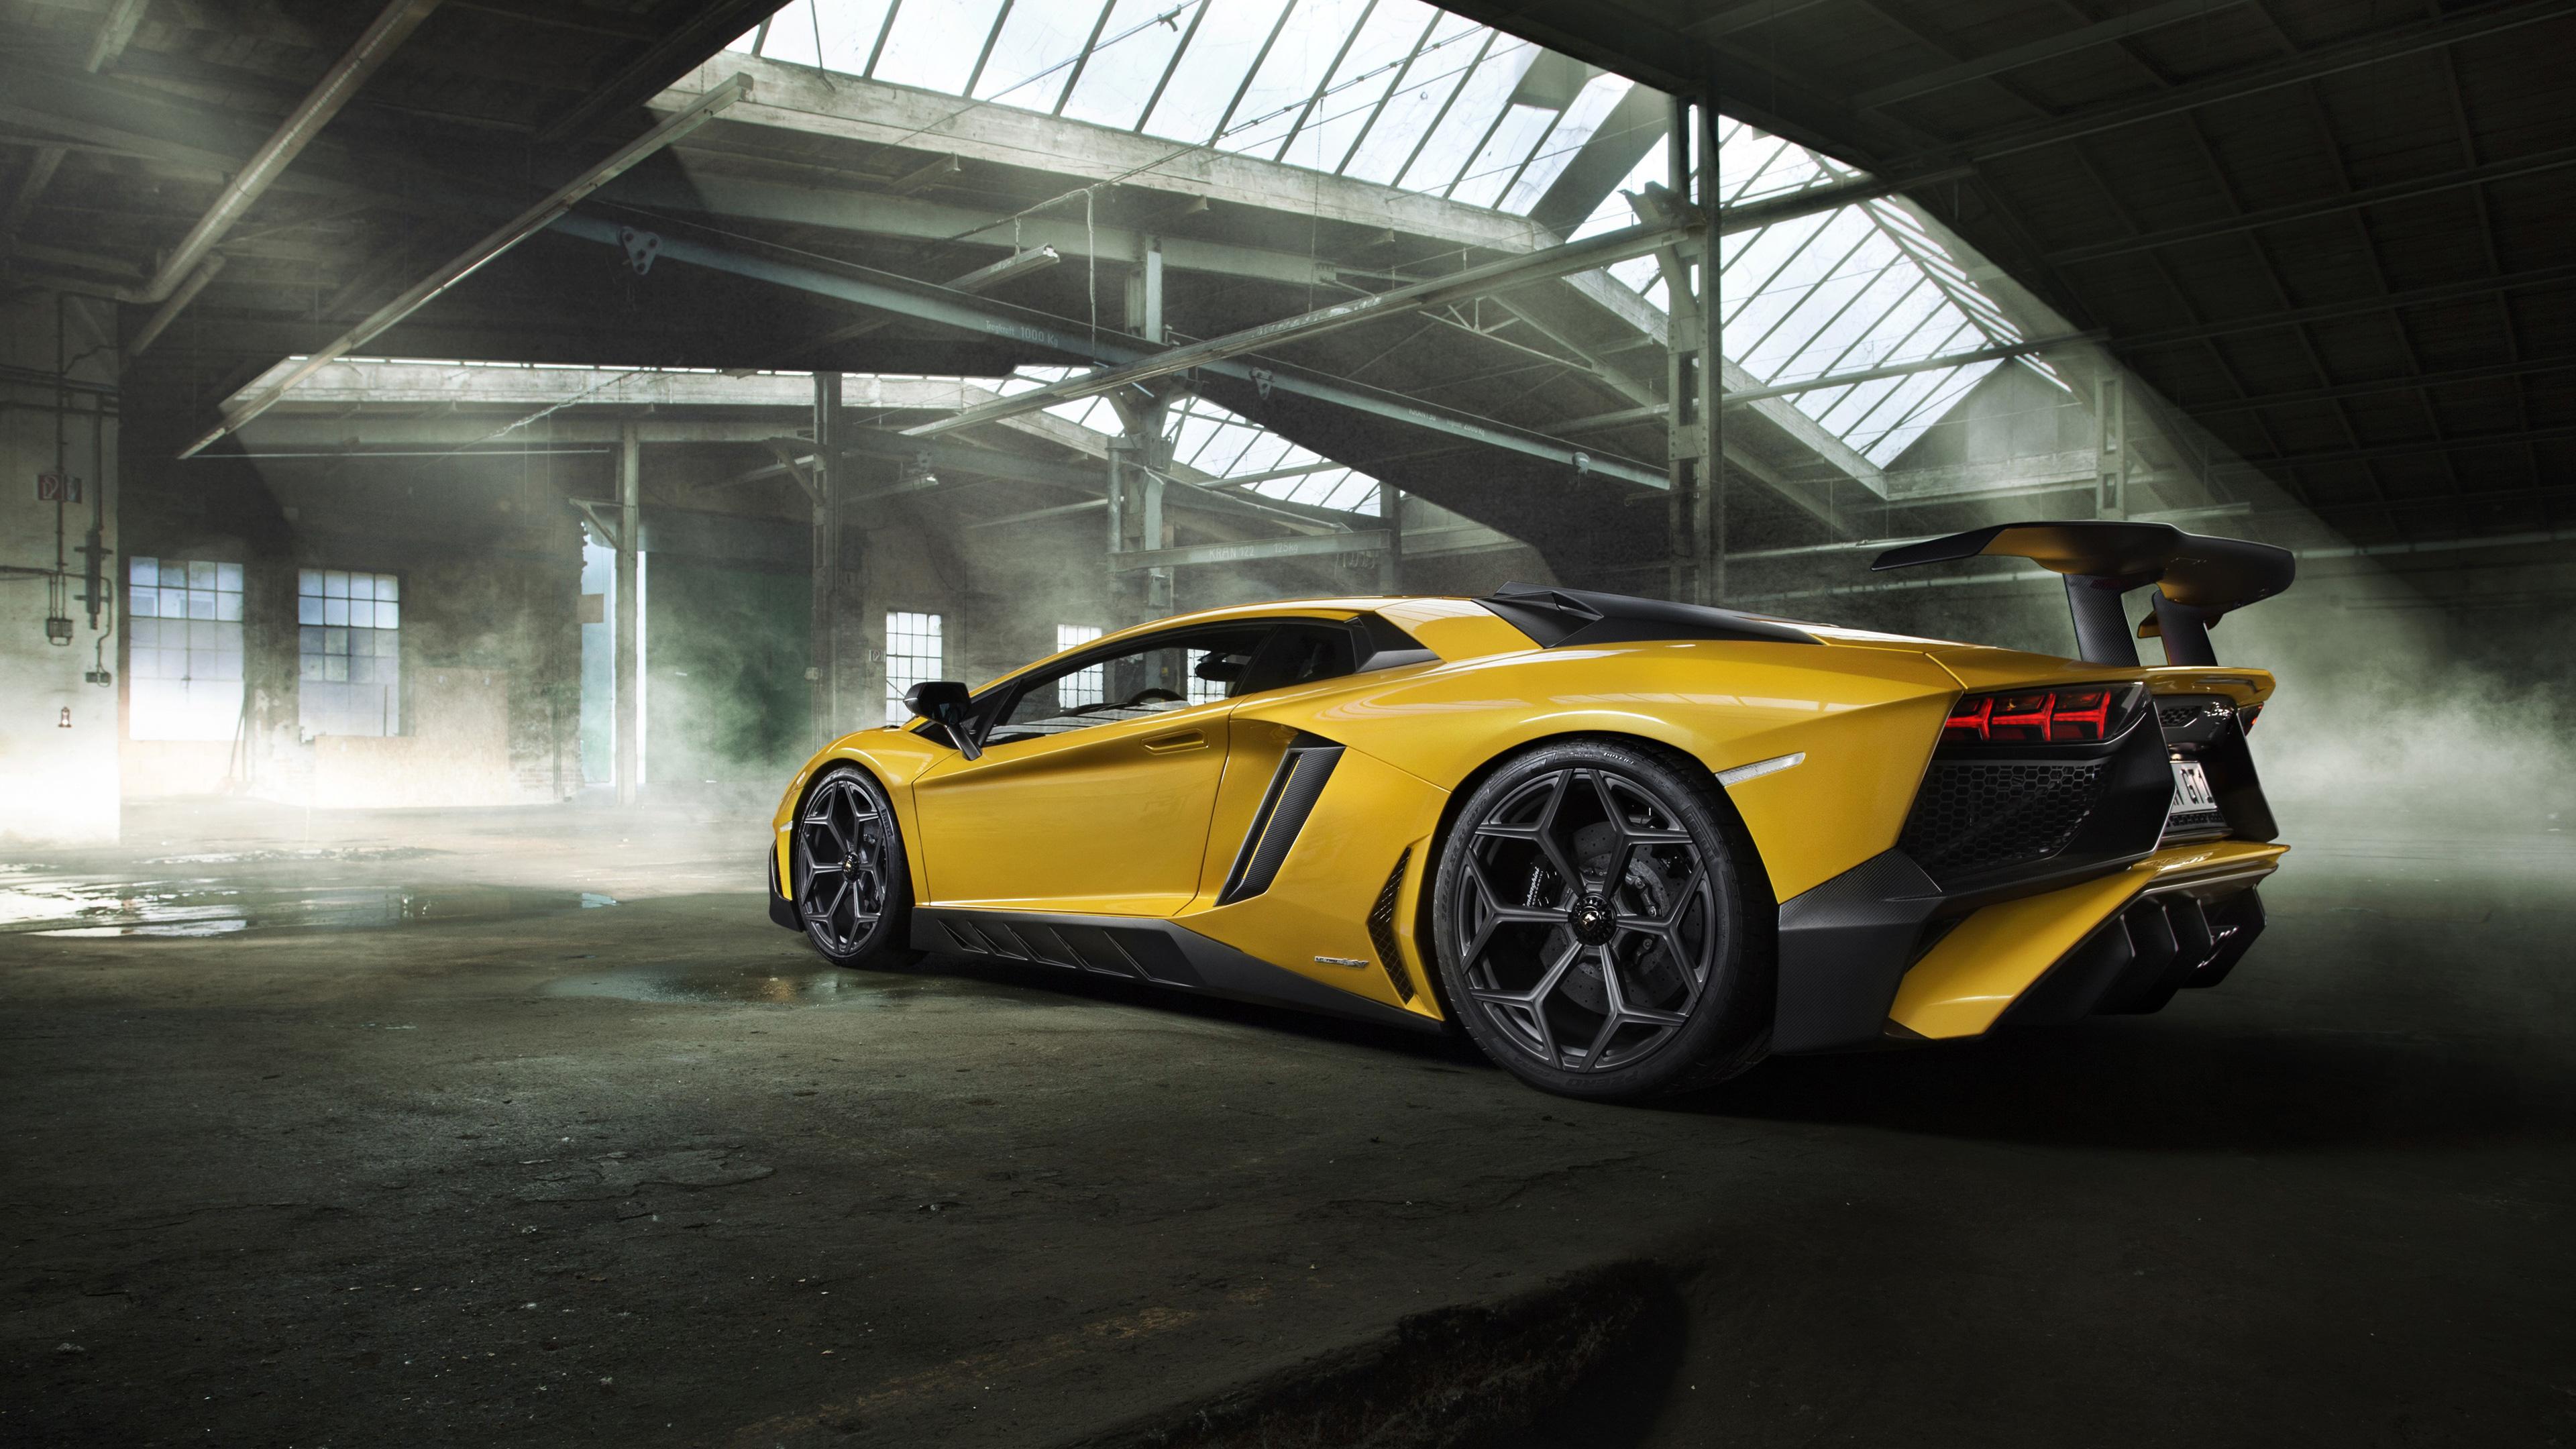 lamborghini aventador superlove hd 1539104550 - Lamborghini Aventador Superlove HD - lamborghini wallpapers, lamborghini aventador wallpapers, cars wallpapers